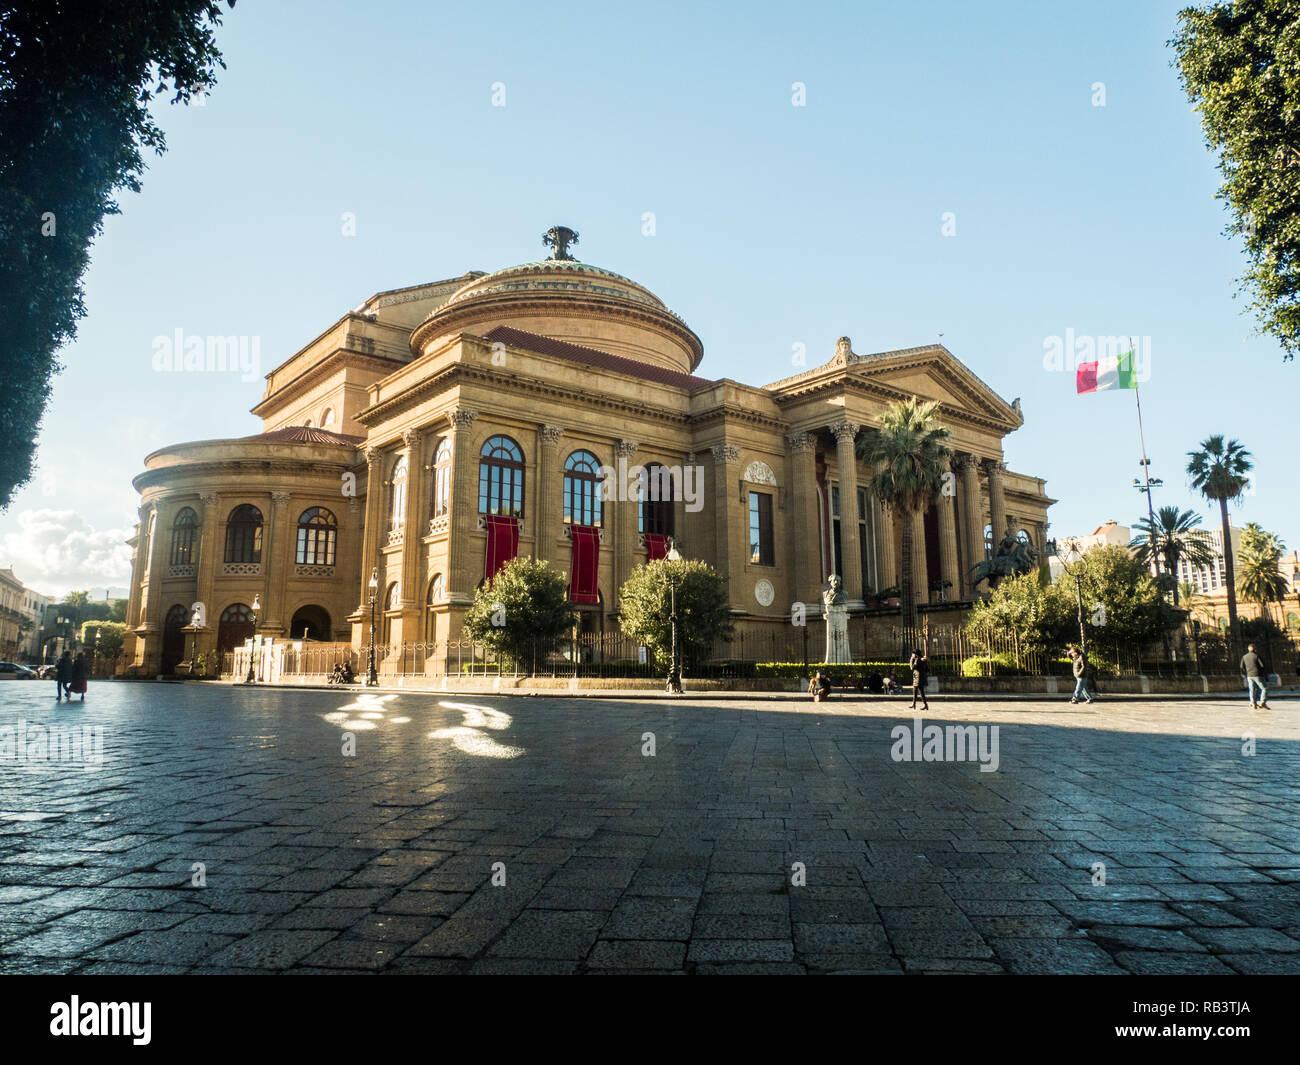 The Teatro Massimo Vittorio Emanuele, an Opera House in Piazza Verdi ...